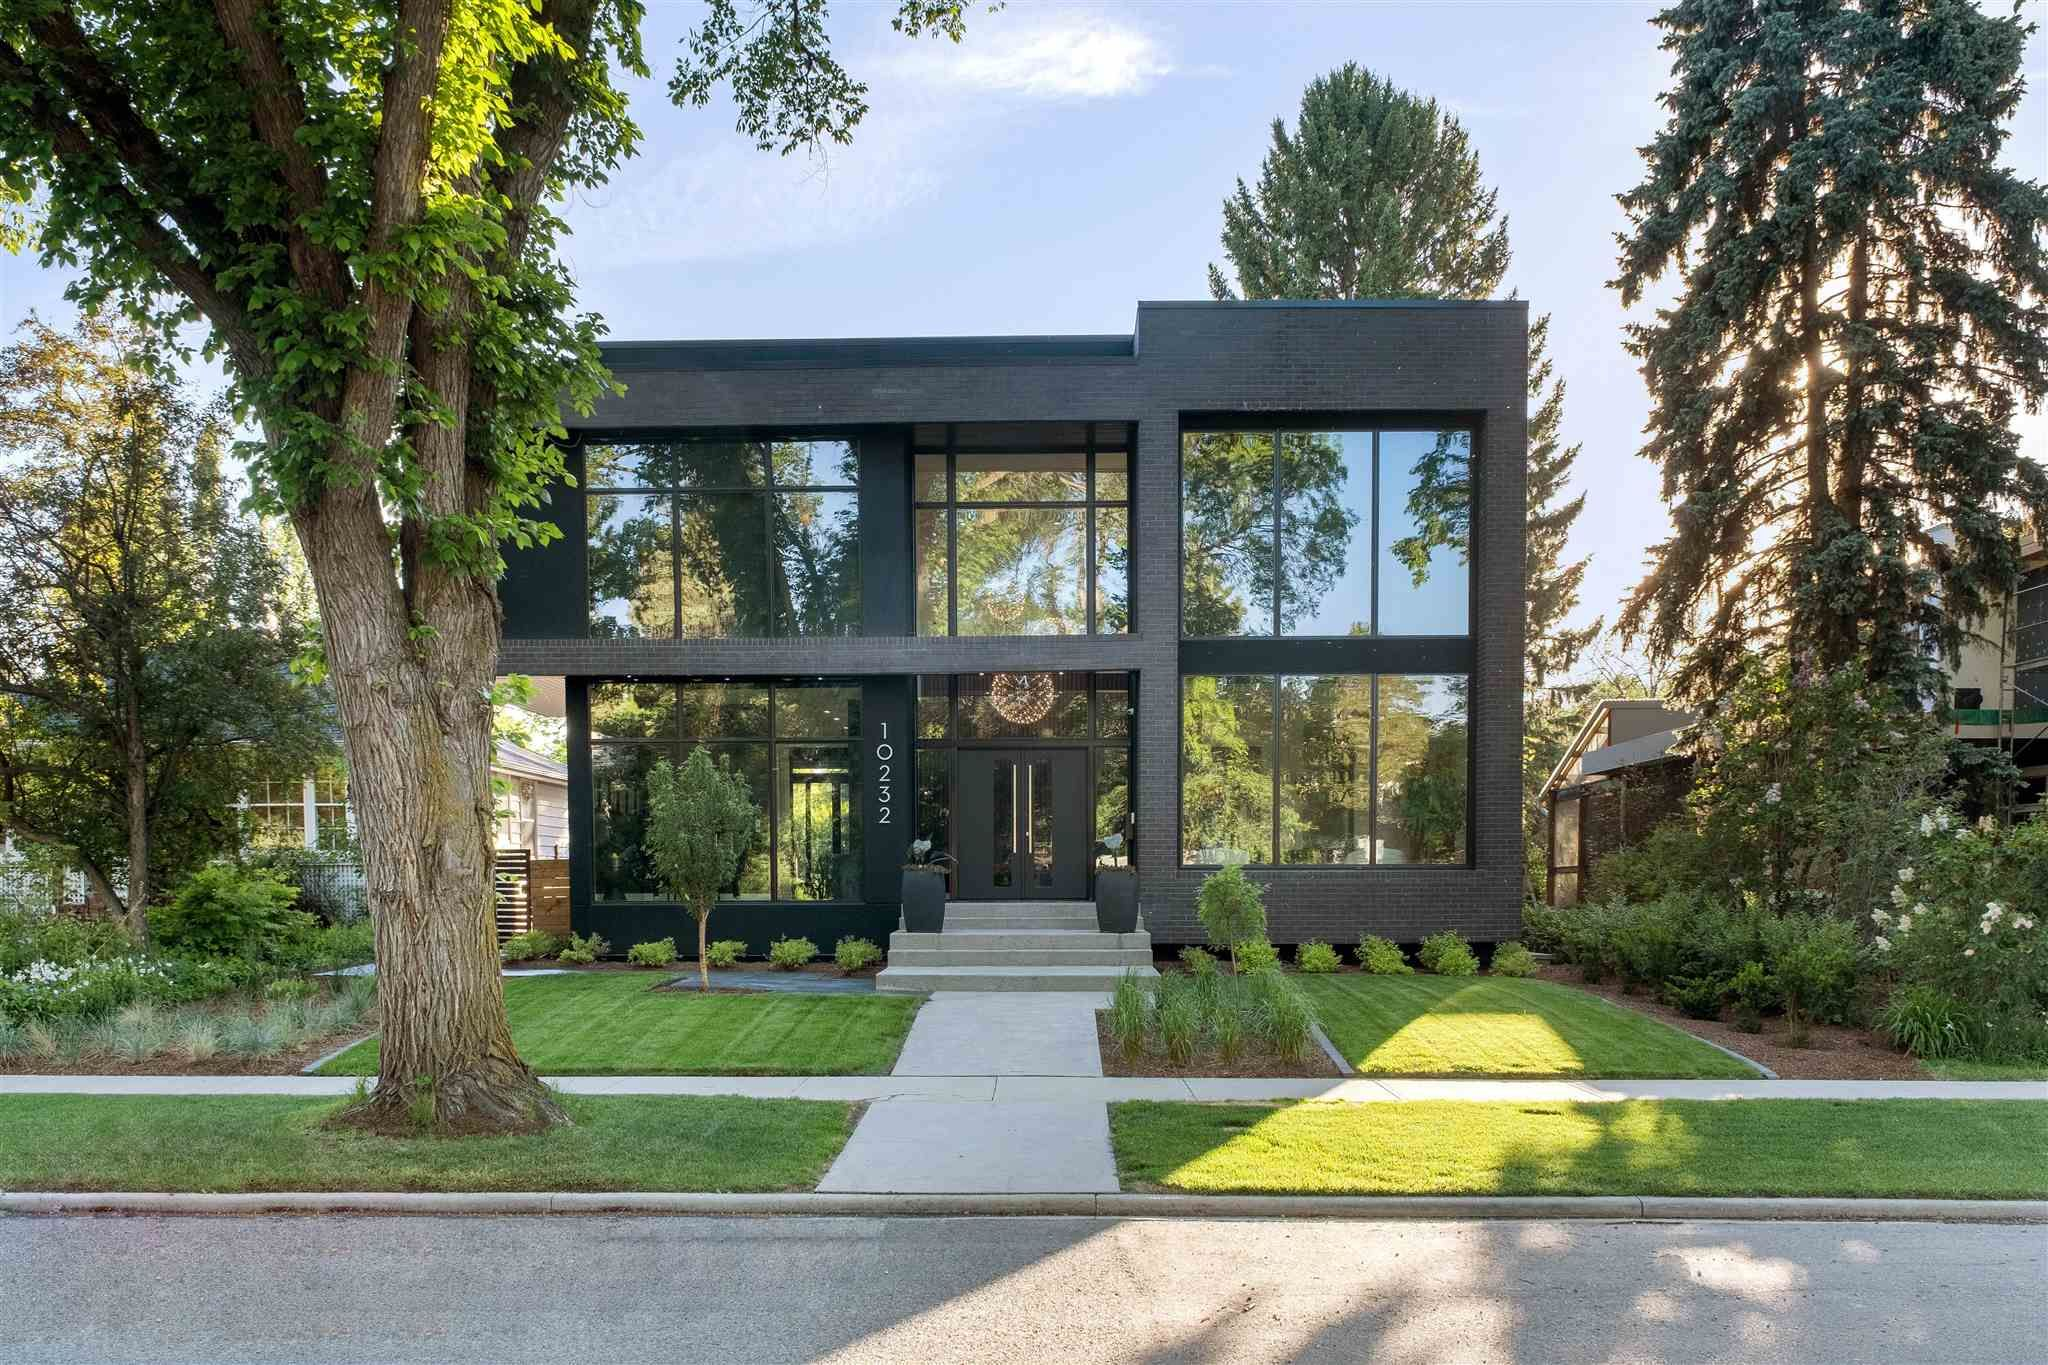 Main Photo: 10232 130 Street in Edmonton: Zone 11 House for sale : MLS®# E4249795